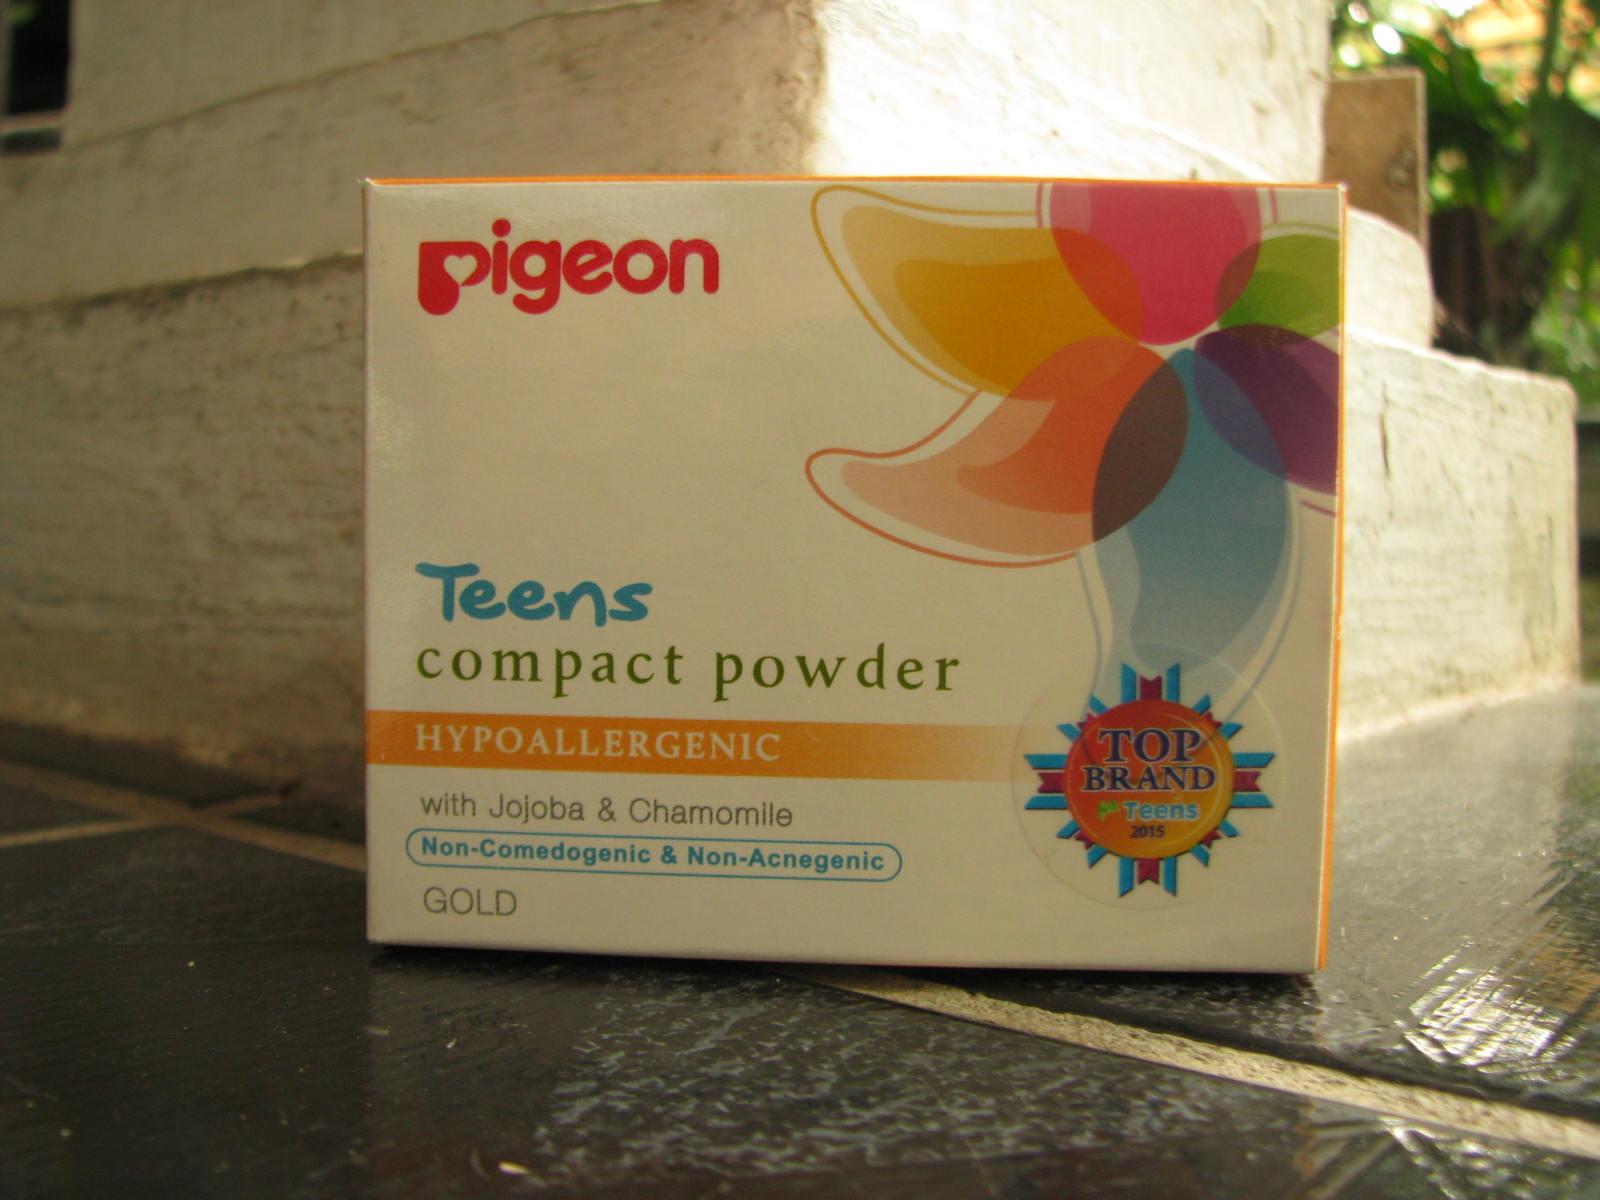 Pigeon Teens Compact Powder Hypoallergenic Yellow 20g Daftar Harga Refill 20 Gr Gold Review 2 Minggu Pemakaian